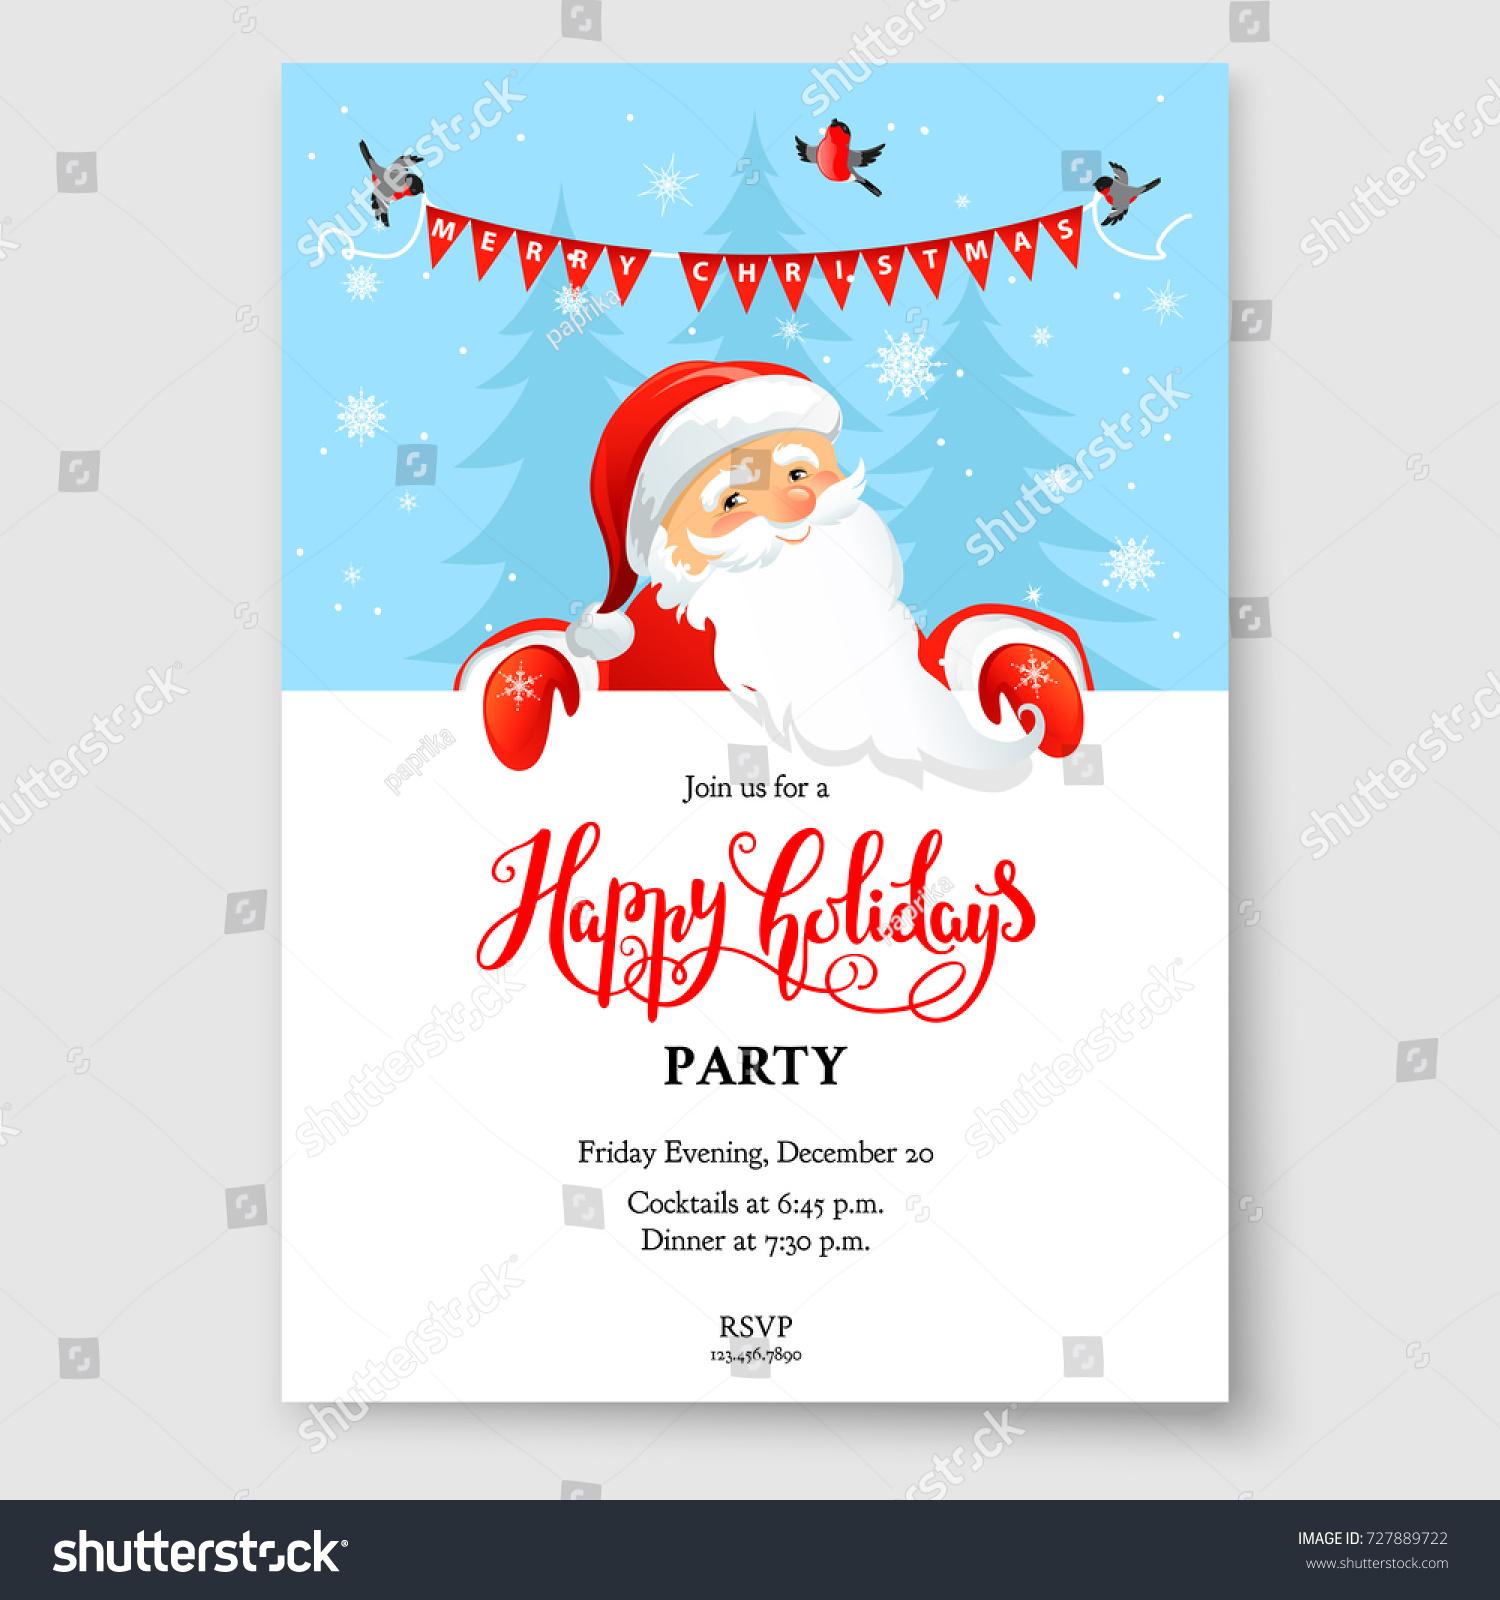 cartoon character santa claus on winter stock vector royalty free